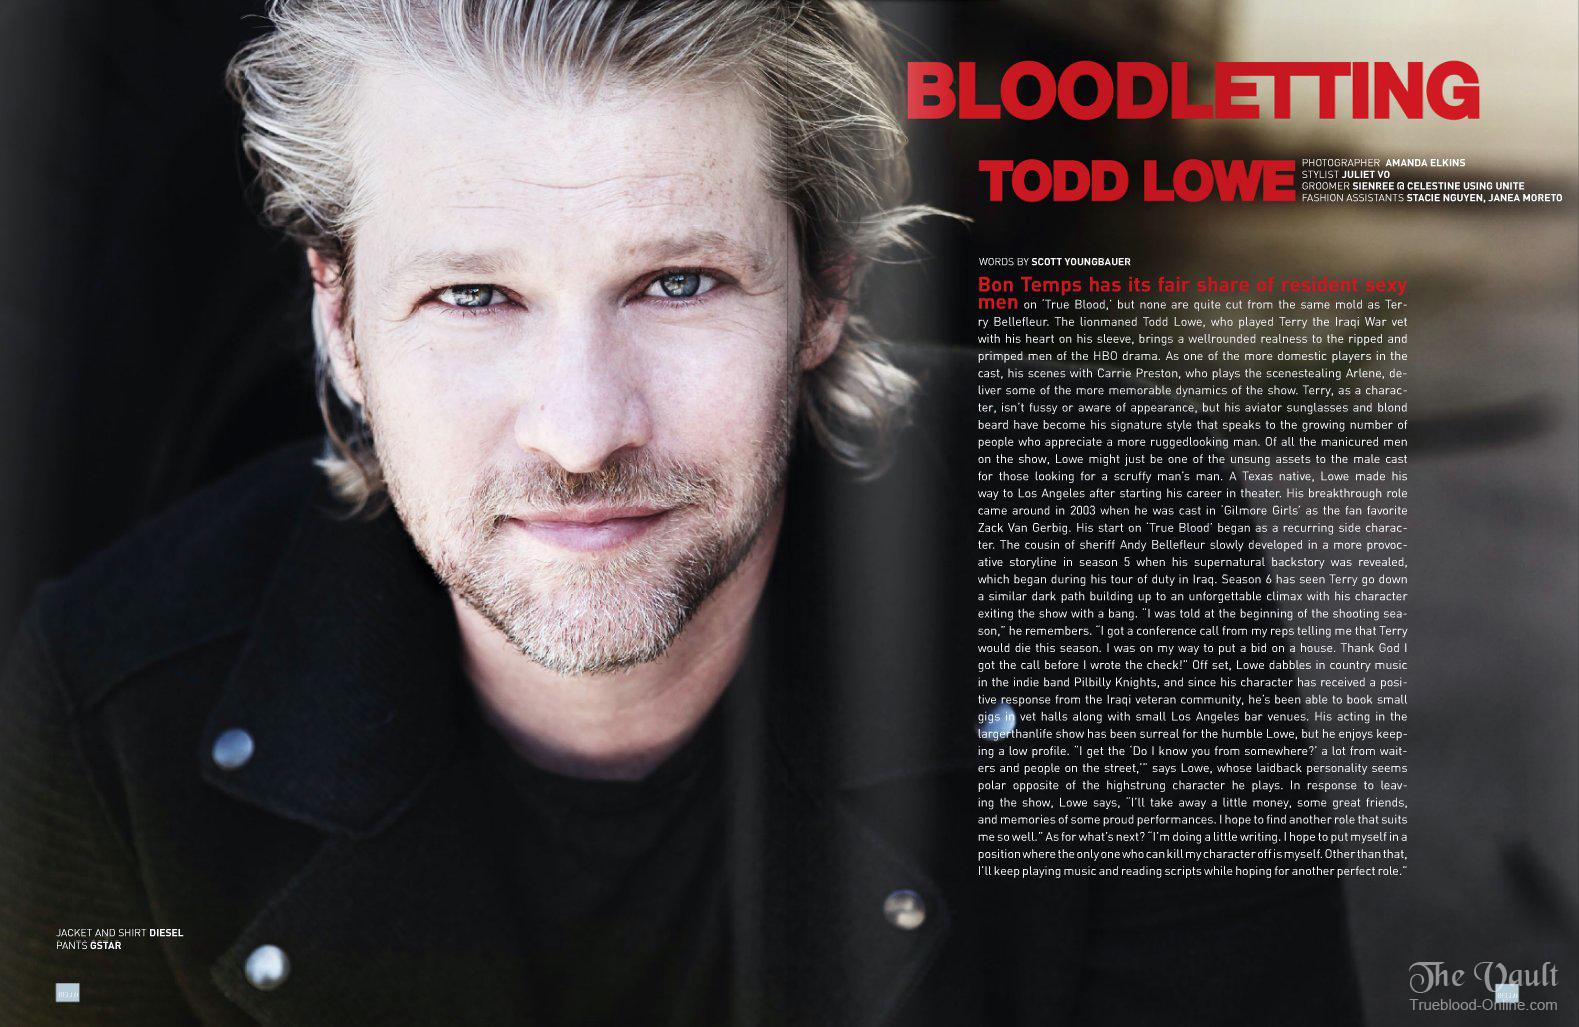 todd lowe and rob lowe